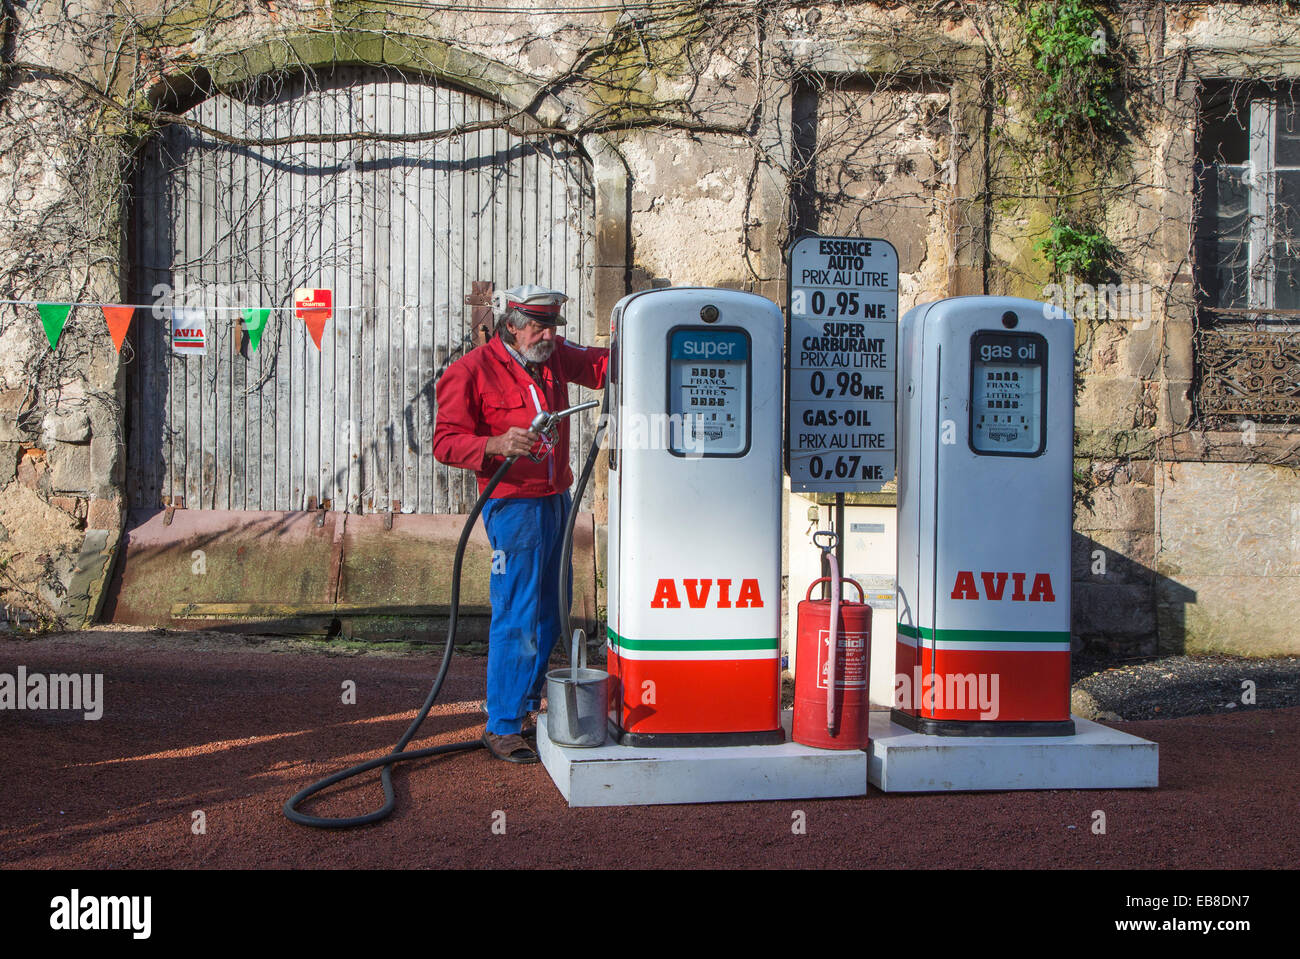 Antique Avia fuel pumps and service station attendant during the Embouteillage de la Route Nationale 7 at Lapalisse, - Stock Image